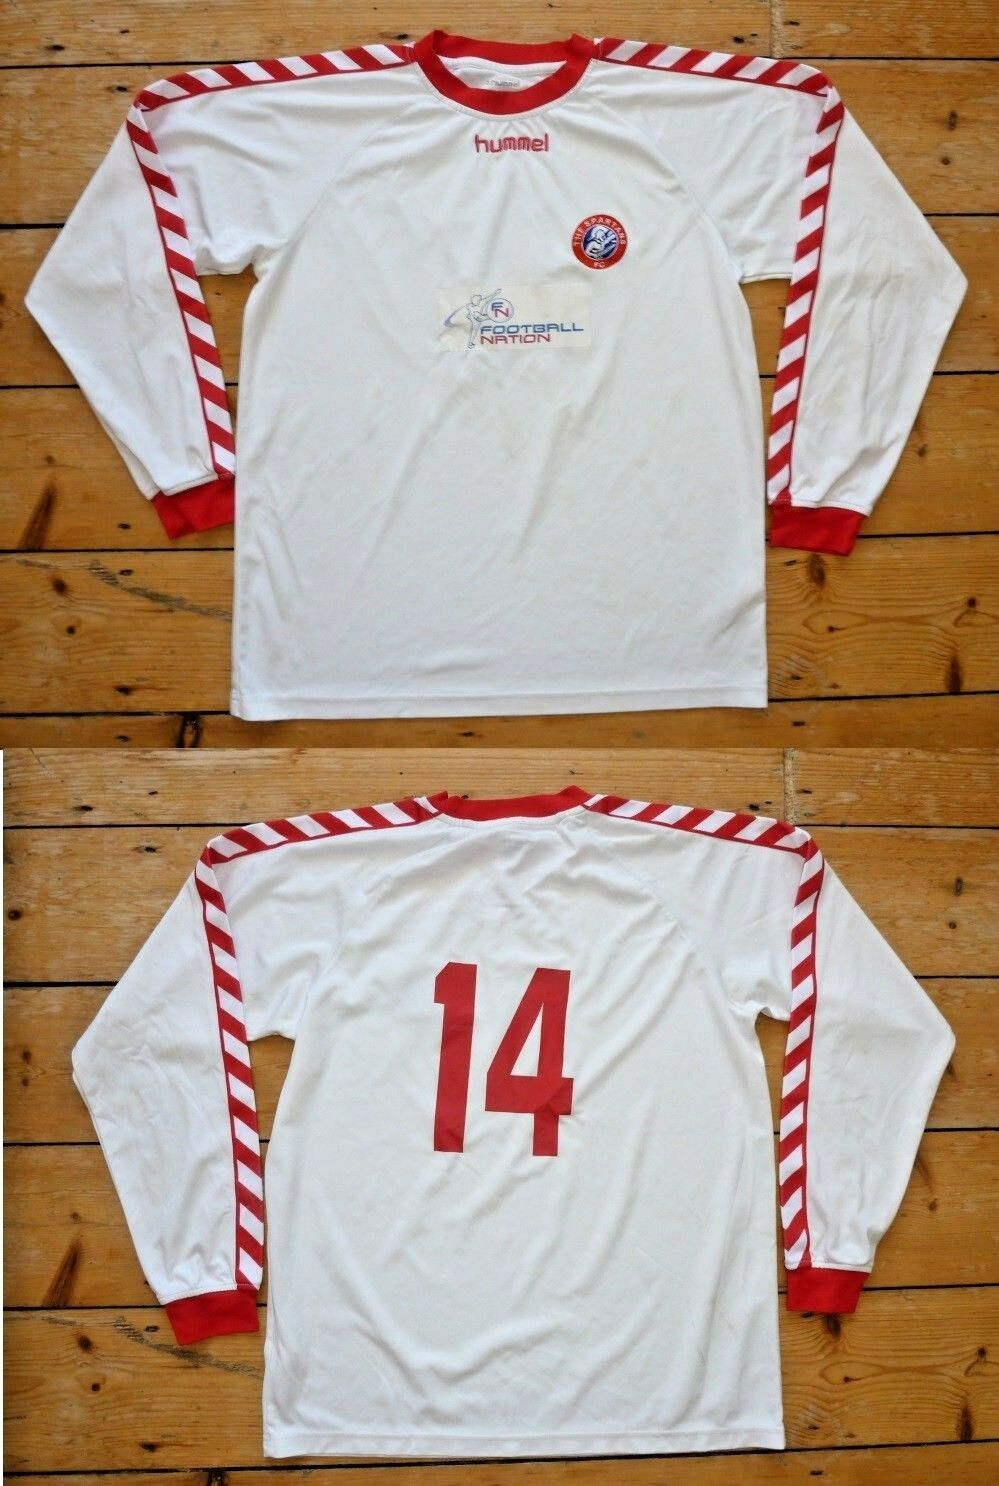 Größe: L Spartans Fußball Trikot Fußball Shirt  Heim 14 Matchworn Heim  Trikot 0fcc32